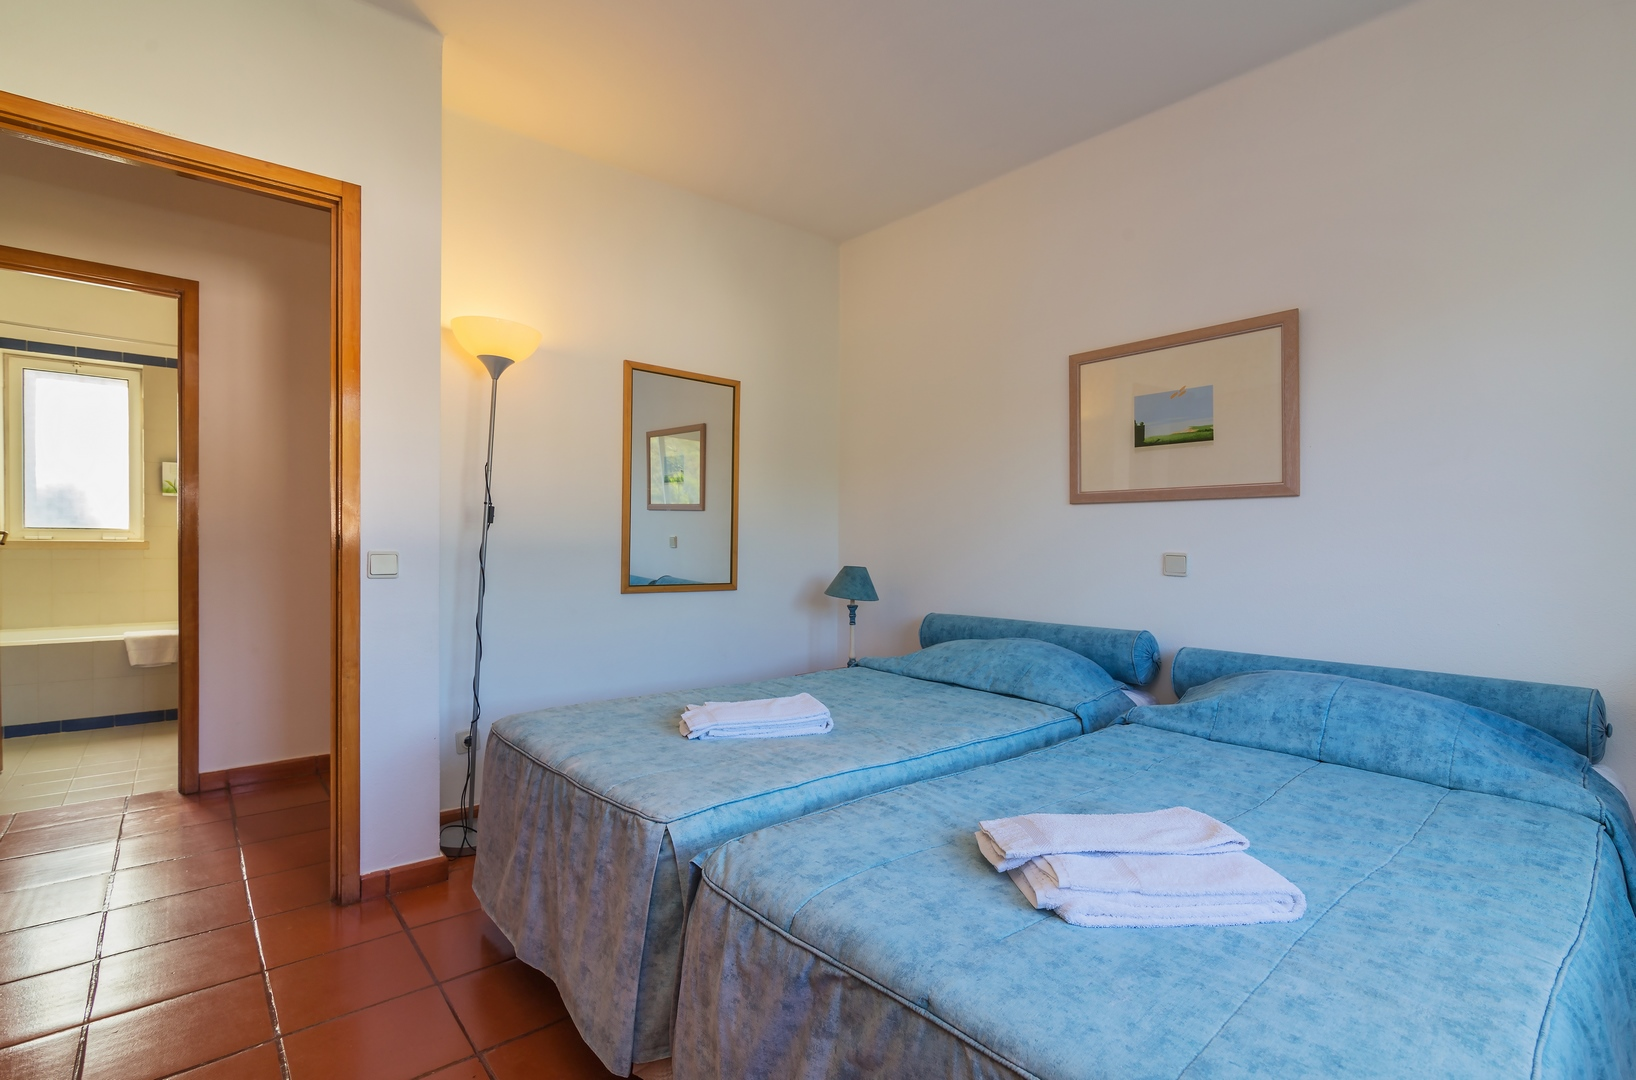 2 Bedroom Townhouse For Sale In Vilar do Golfe (9)